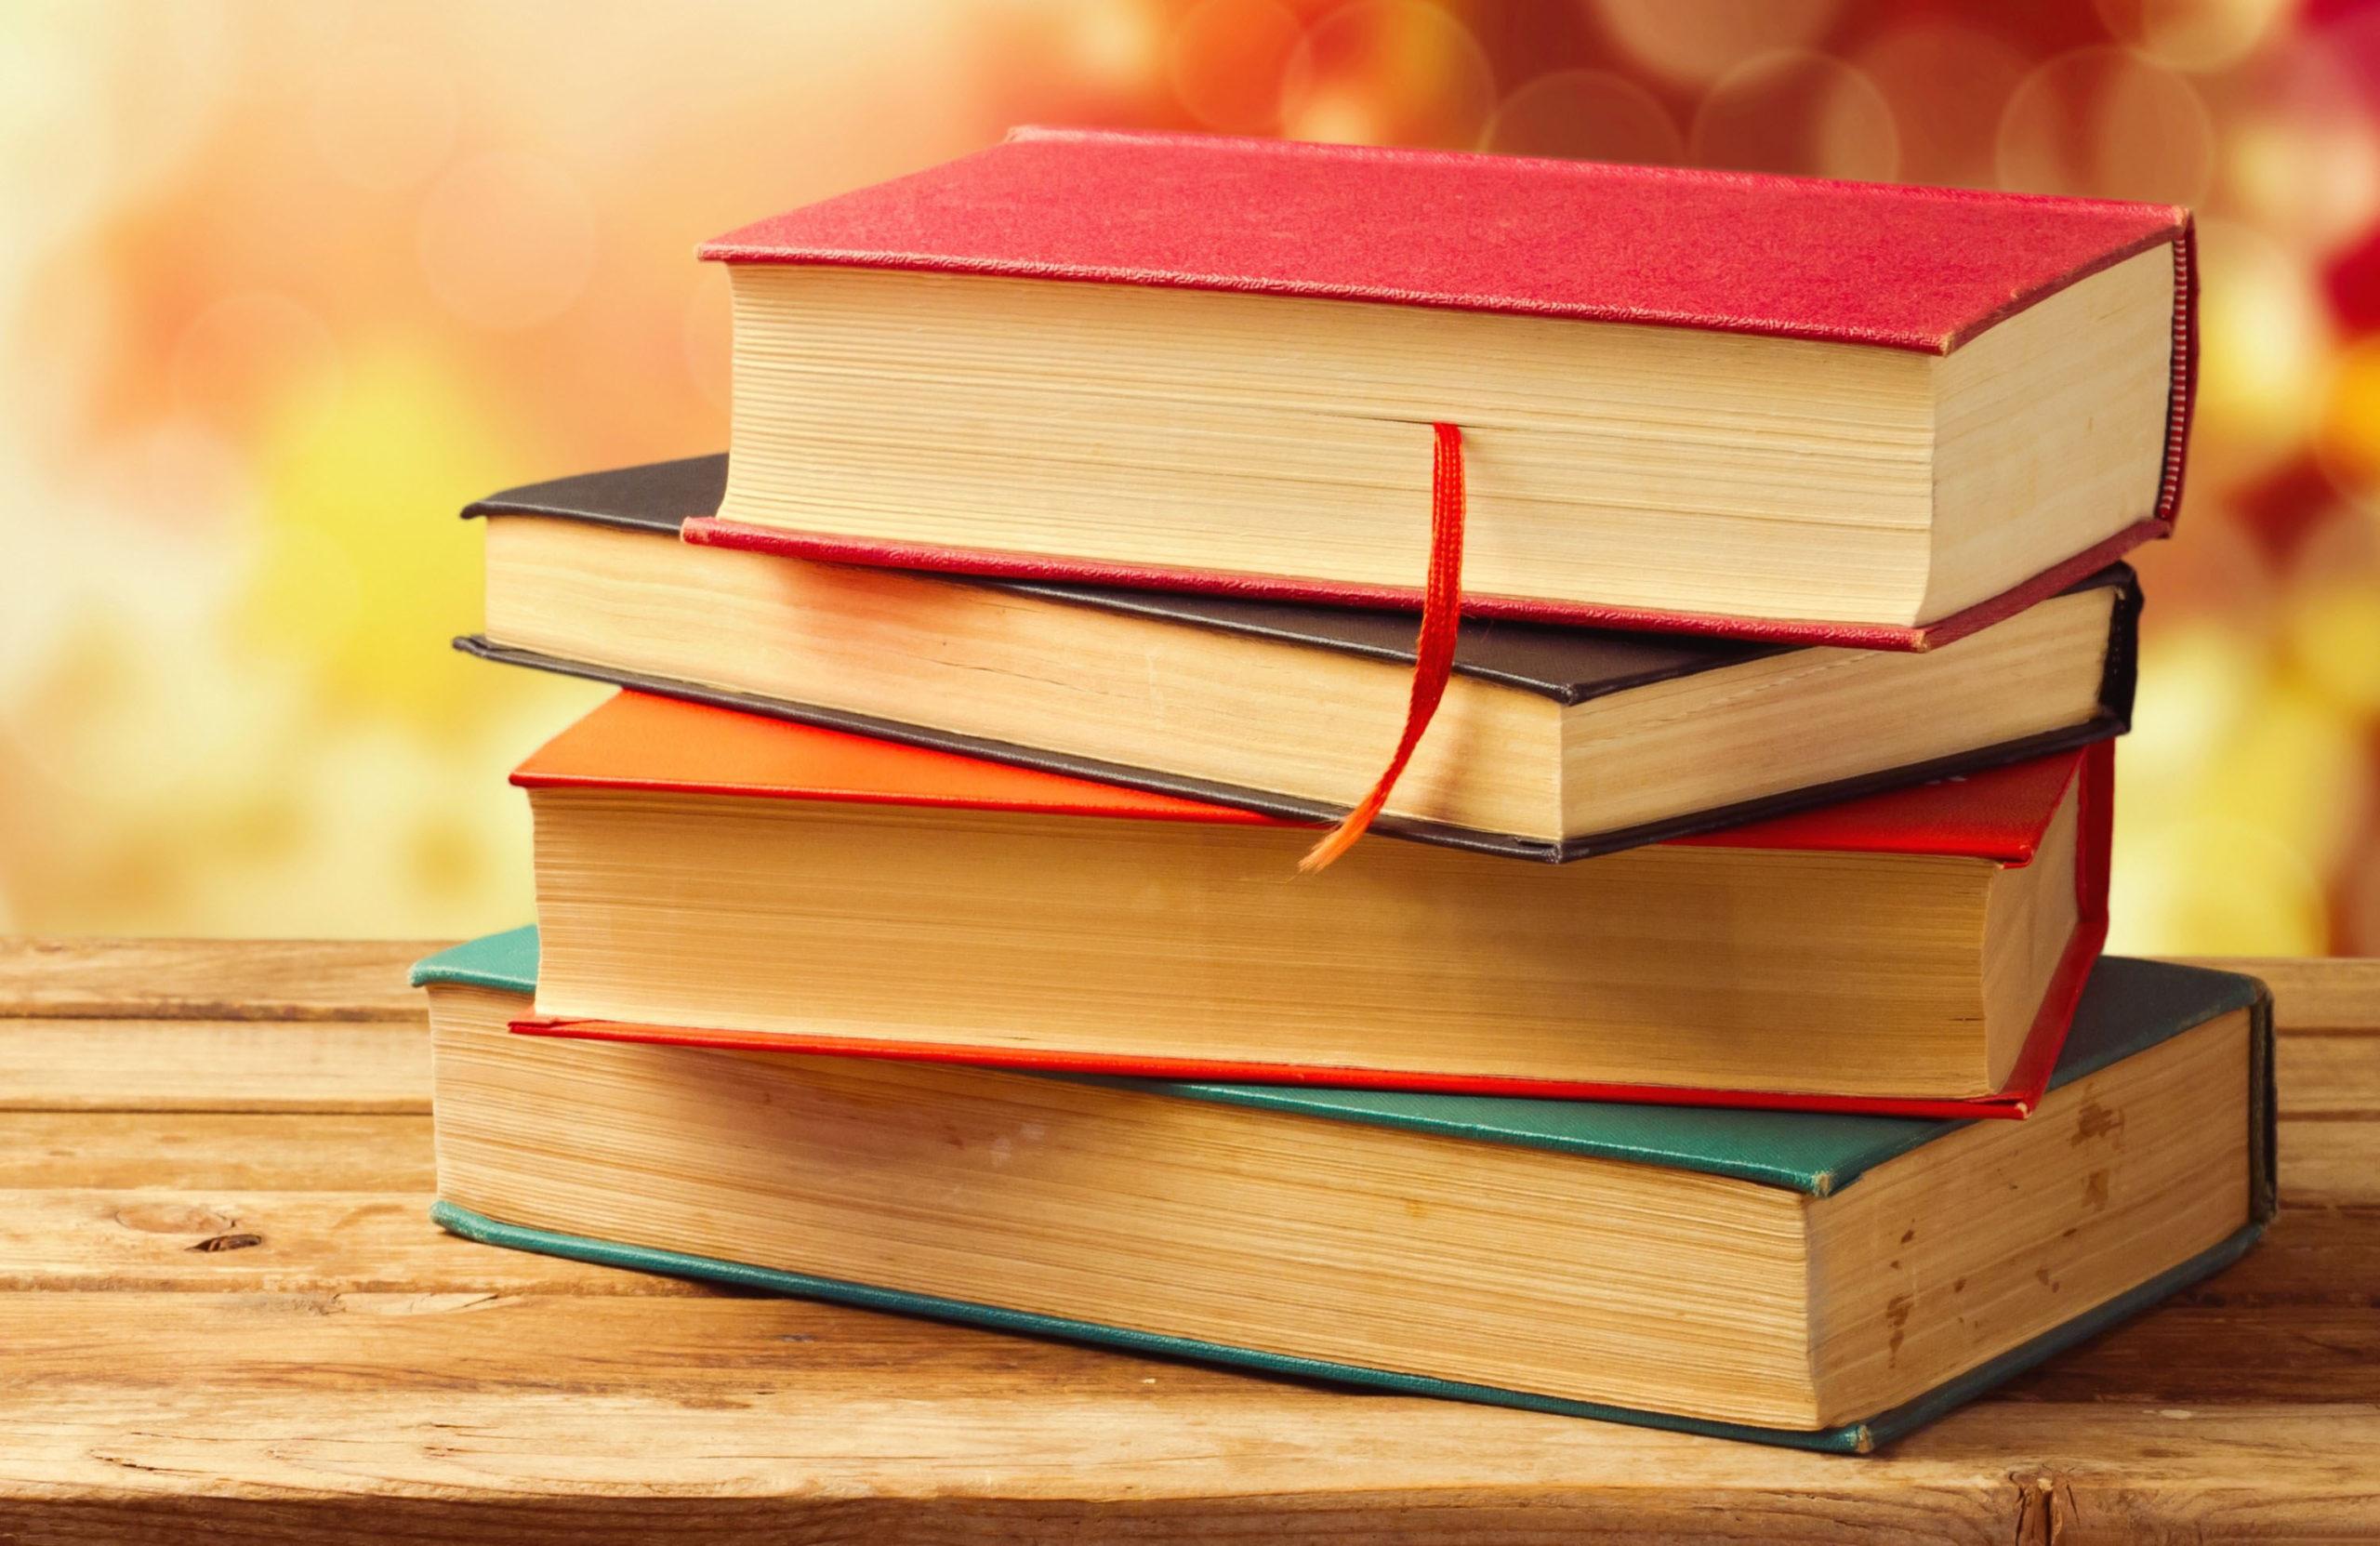 Разбираемся в себе: 3 книги об отношениях родителей и детей